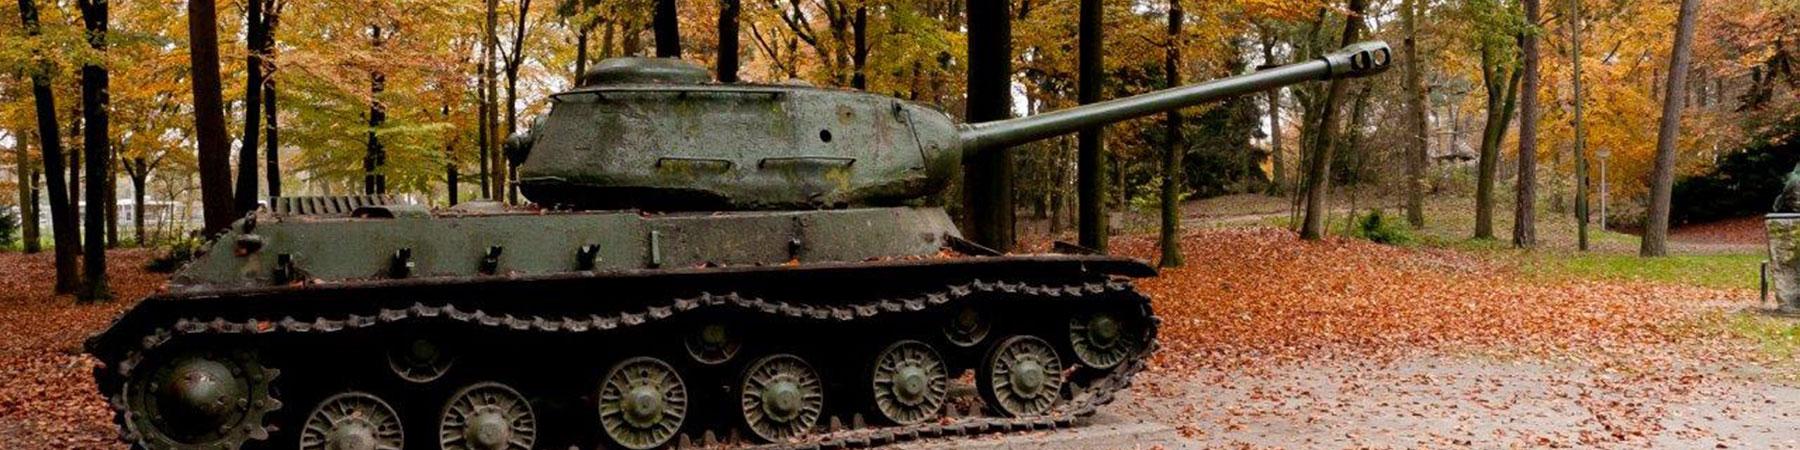 oorlogsmuseum-overloon6